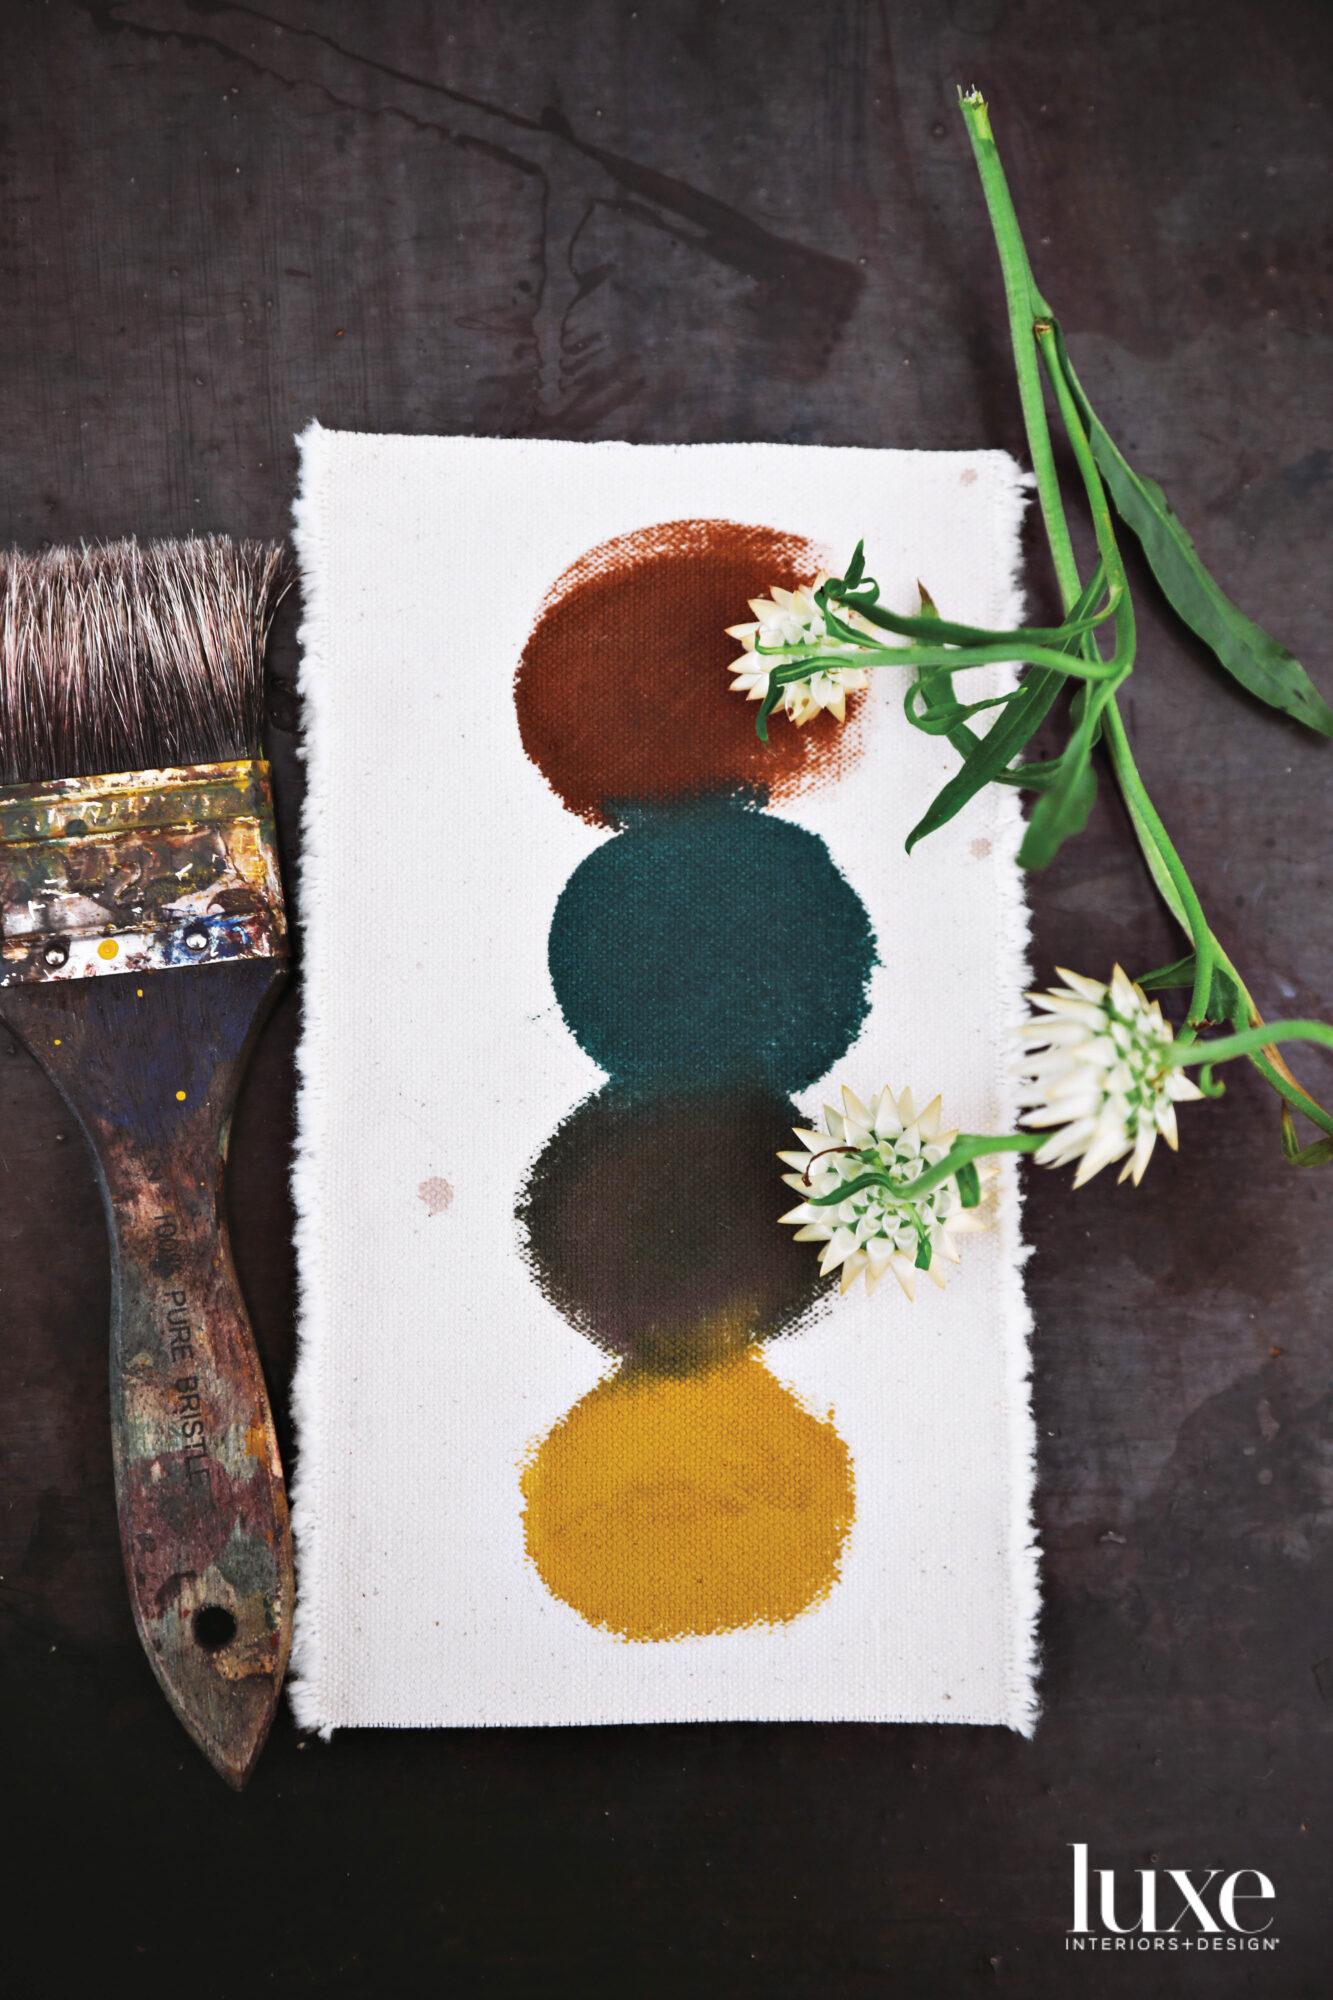 A color study